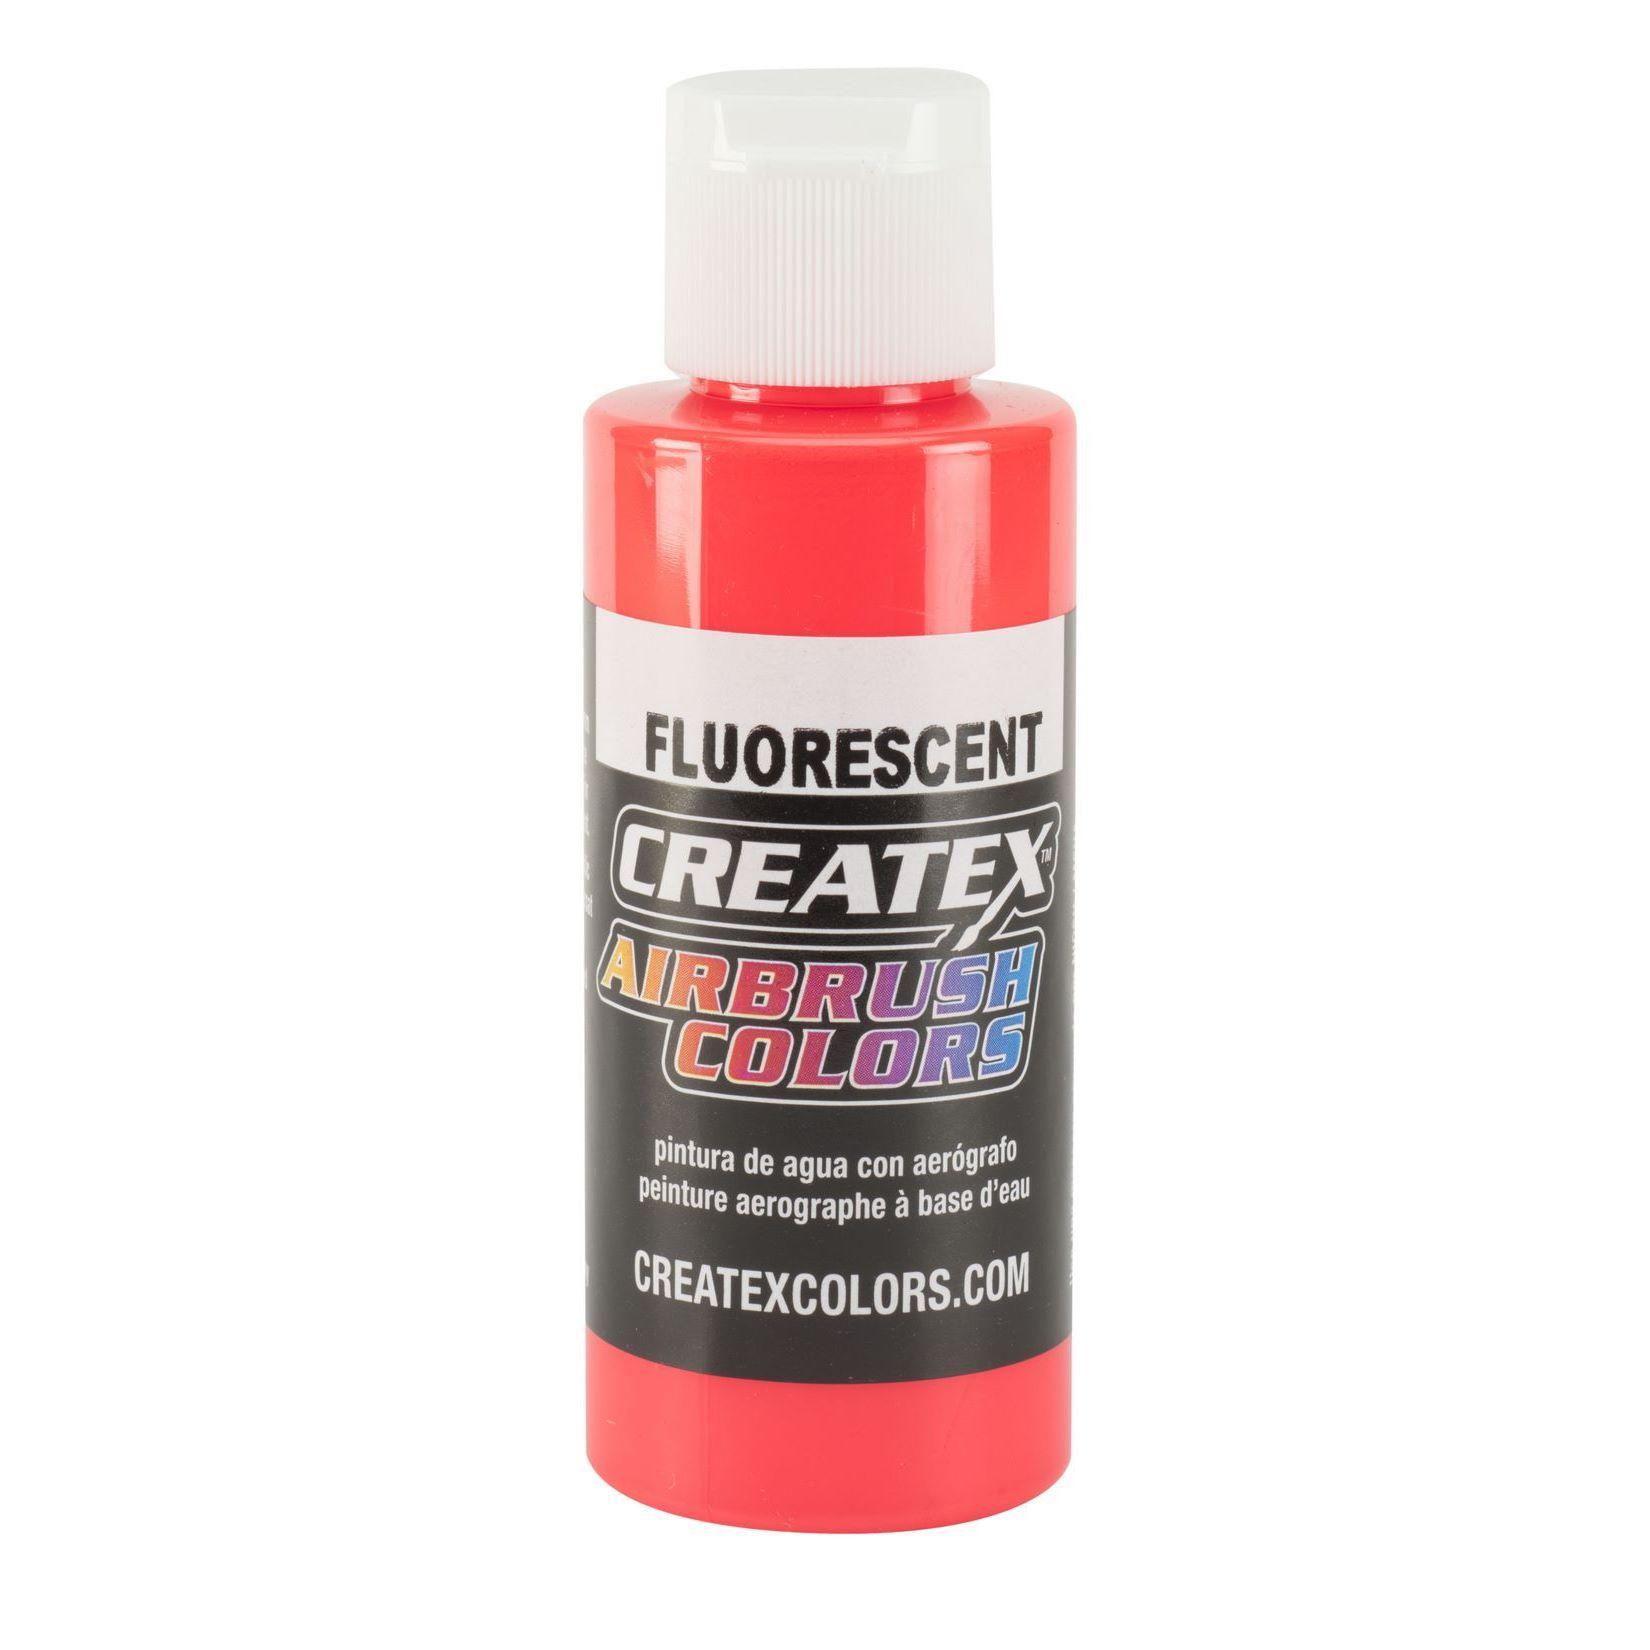 fluorescent Leuchtrot Createx Airbrush Colors Farbe 120ml 12 5408 Createx